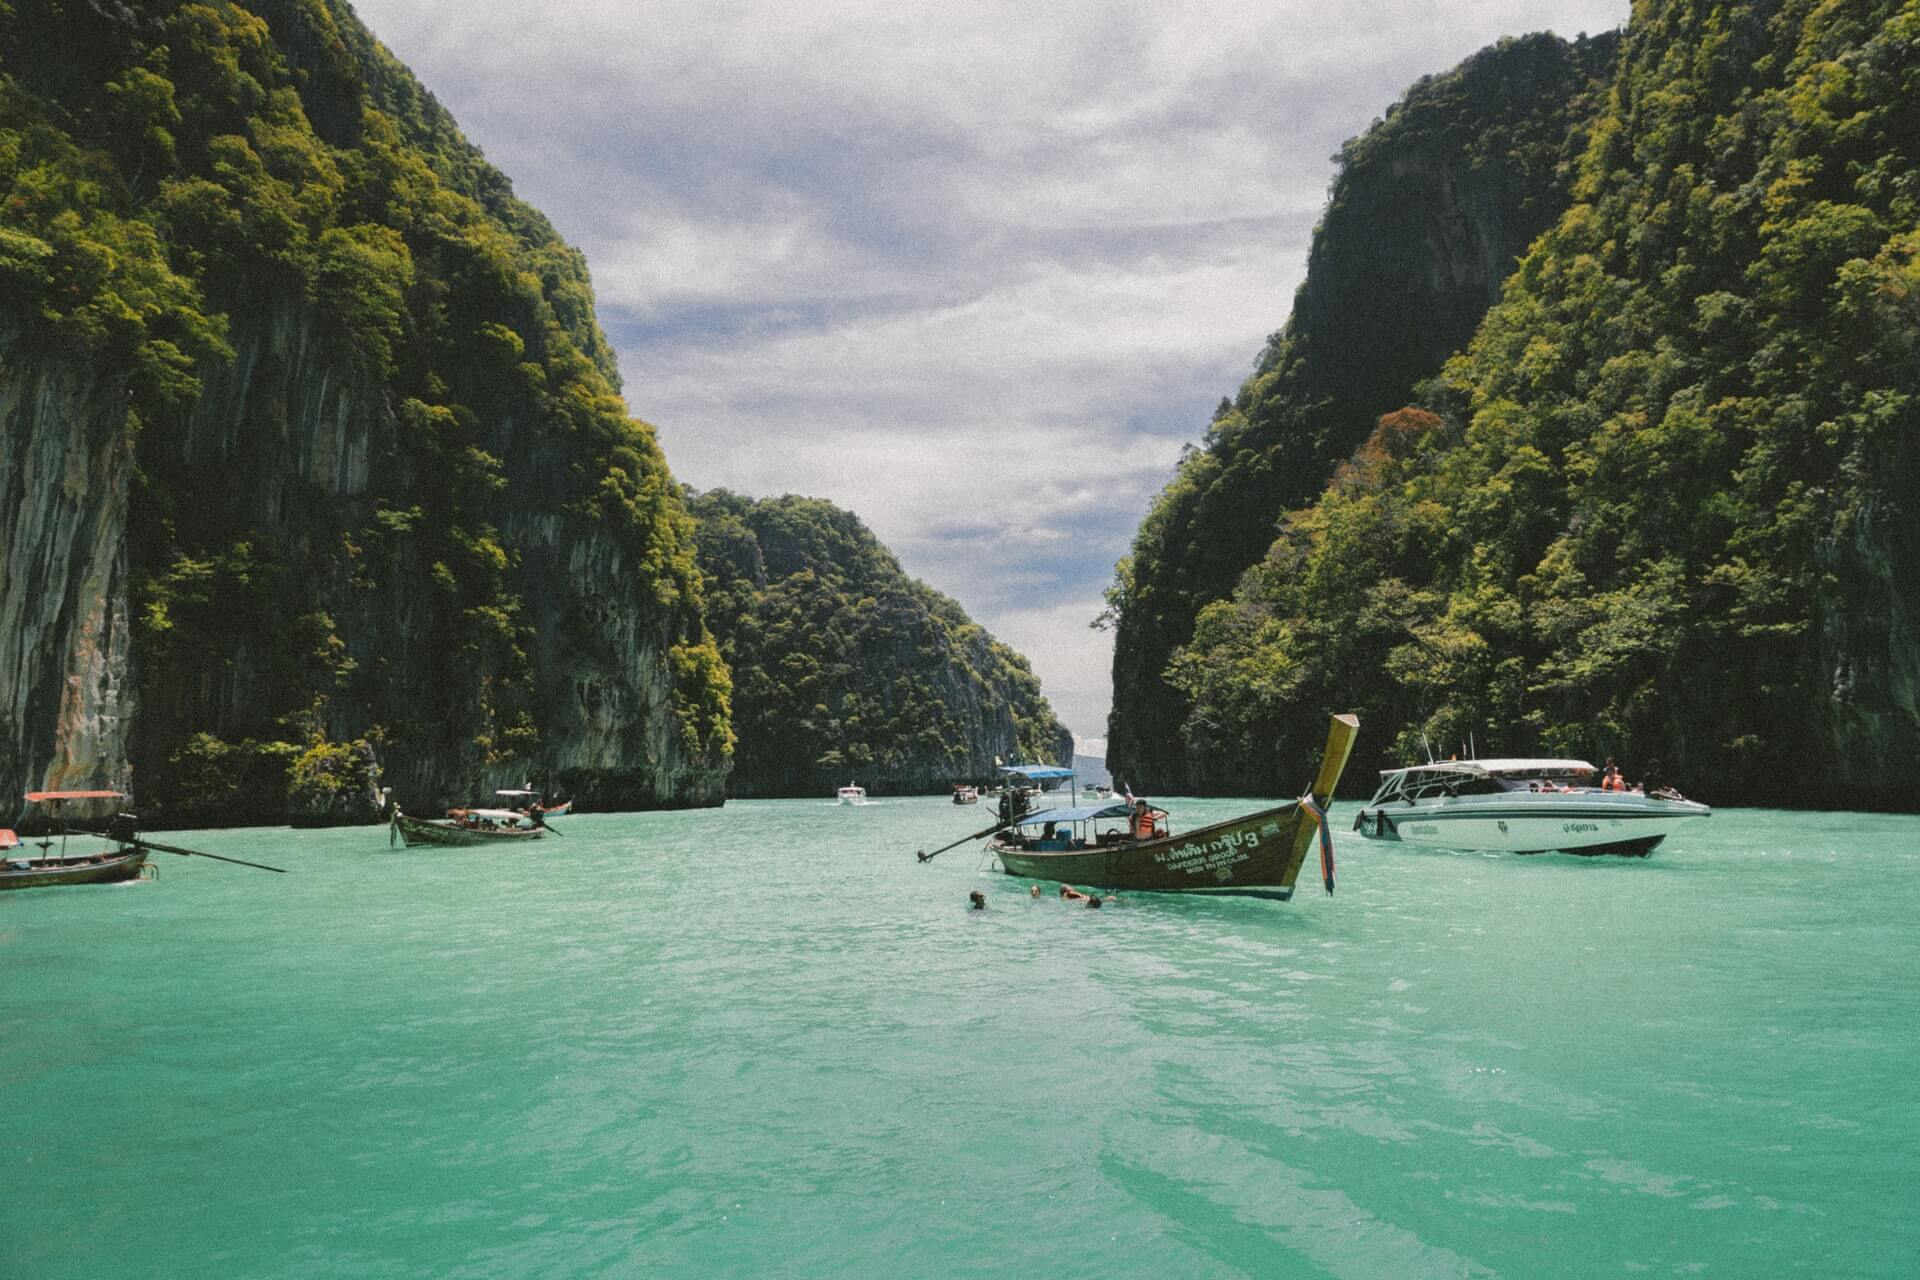 thailand-brand-image-2.jpg